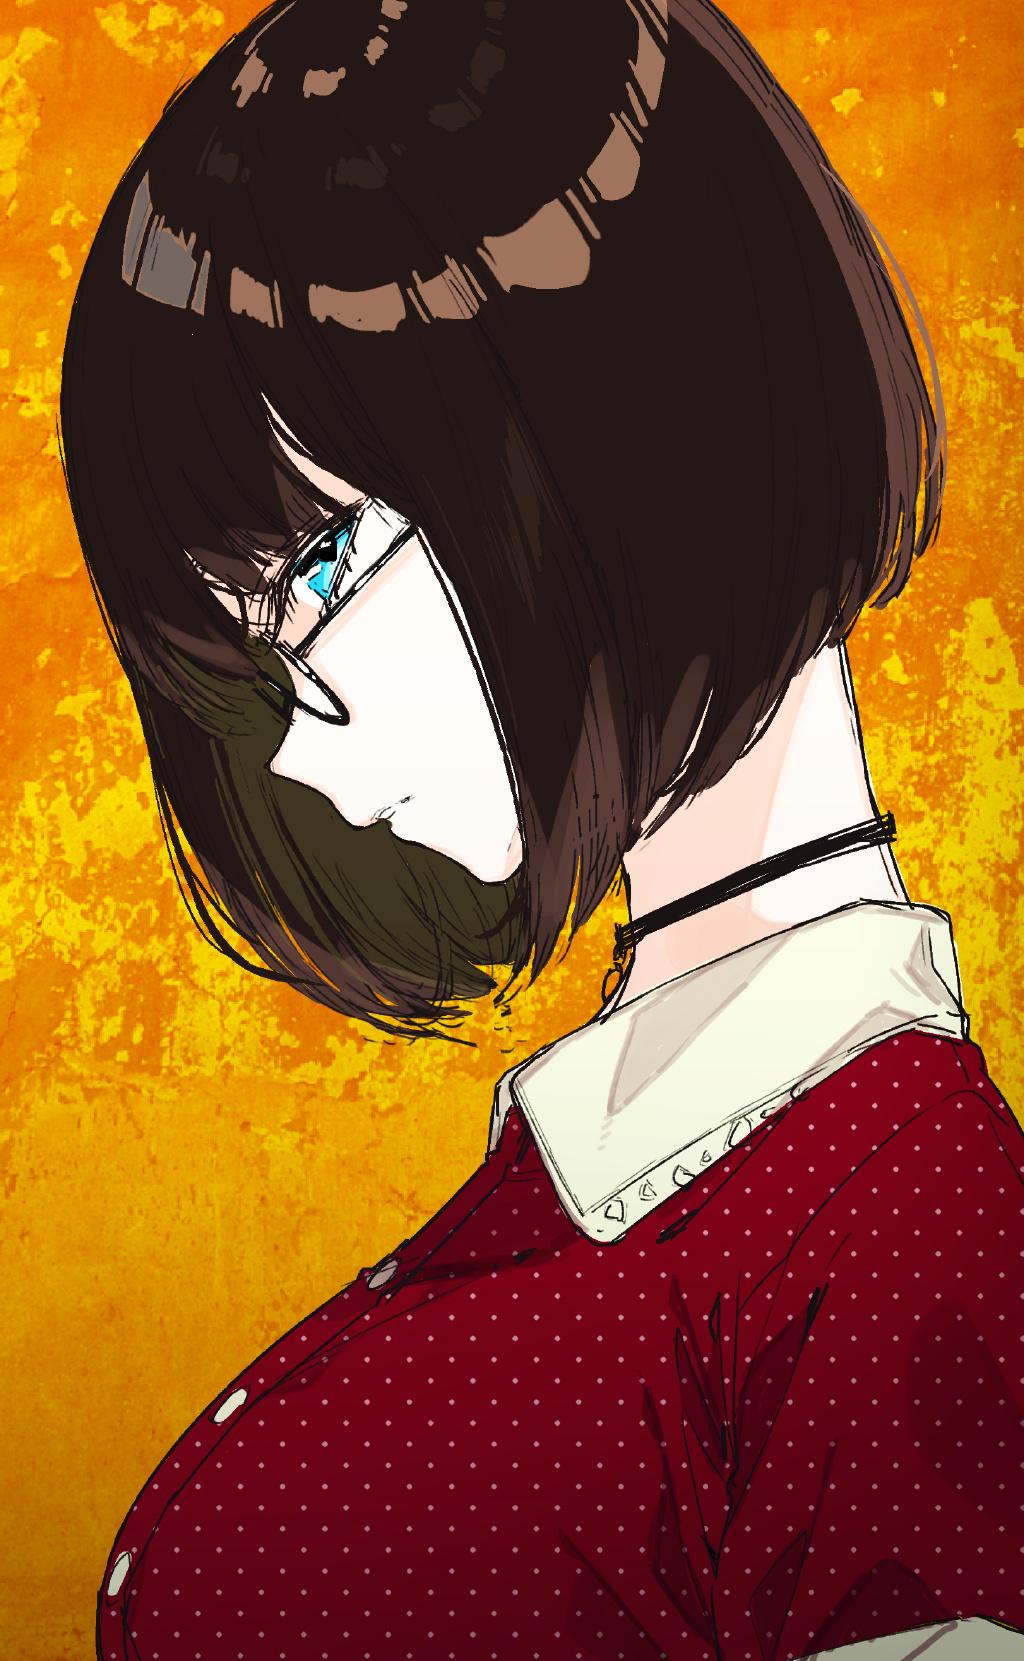 P站精选&彩虹人?日本画师かやはら的插画作品-Zhaiuu.Com-宅尤尤